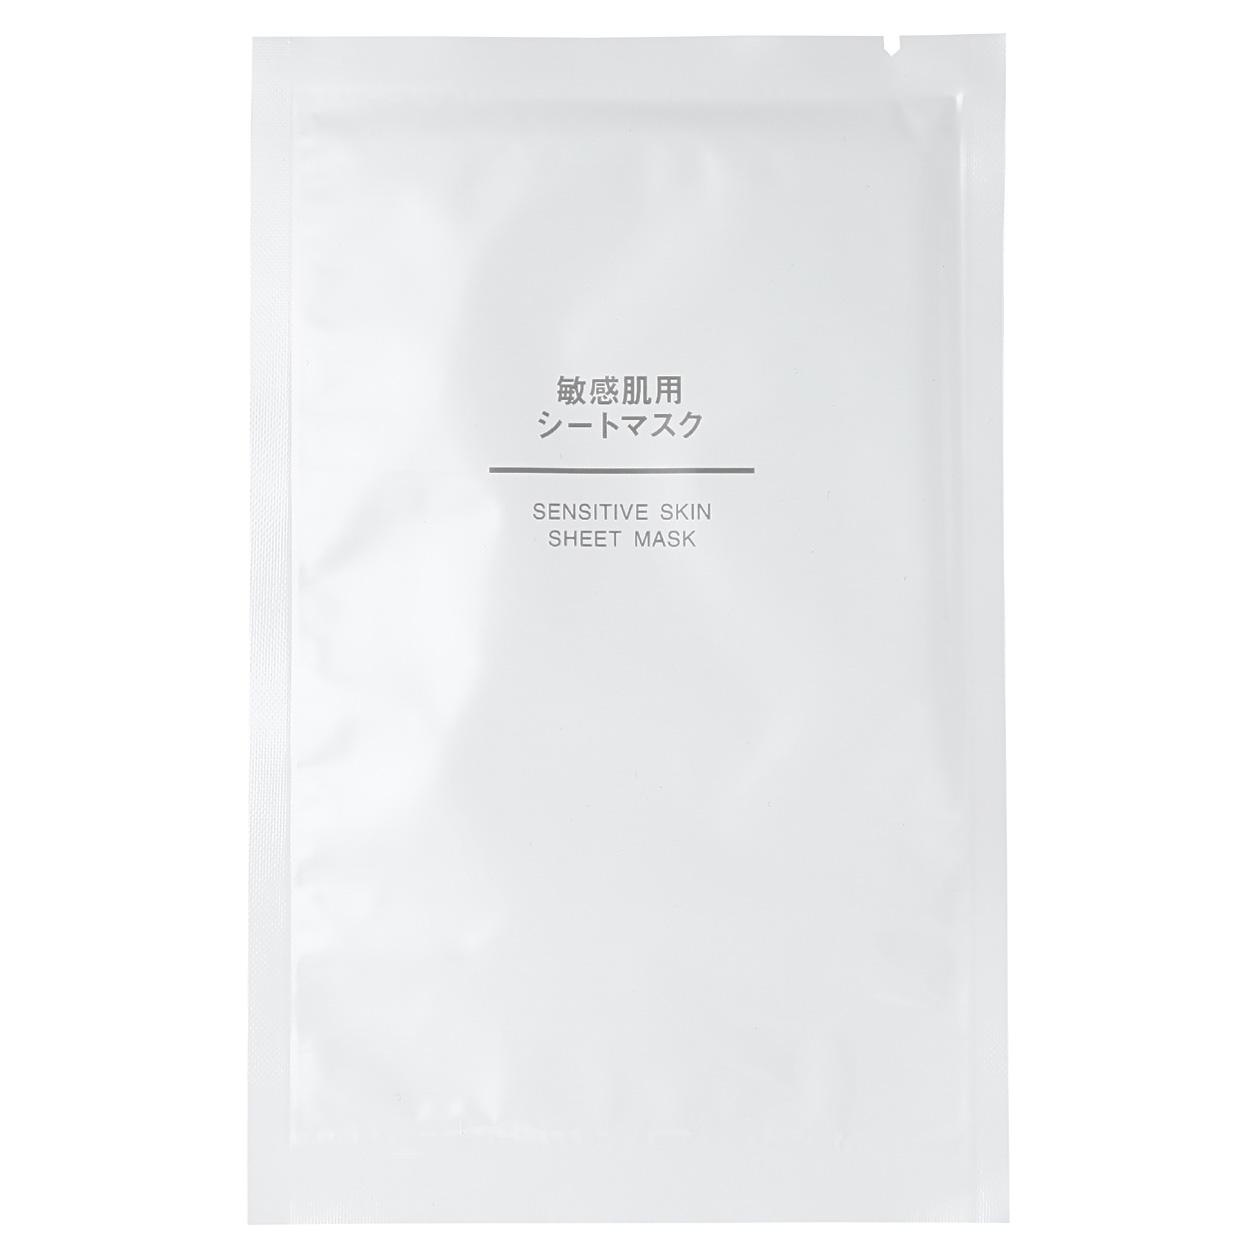 Muji Sensitive Skin Sheet Mask